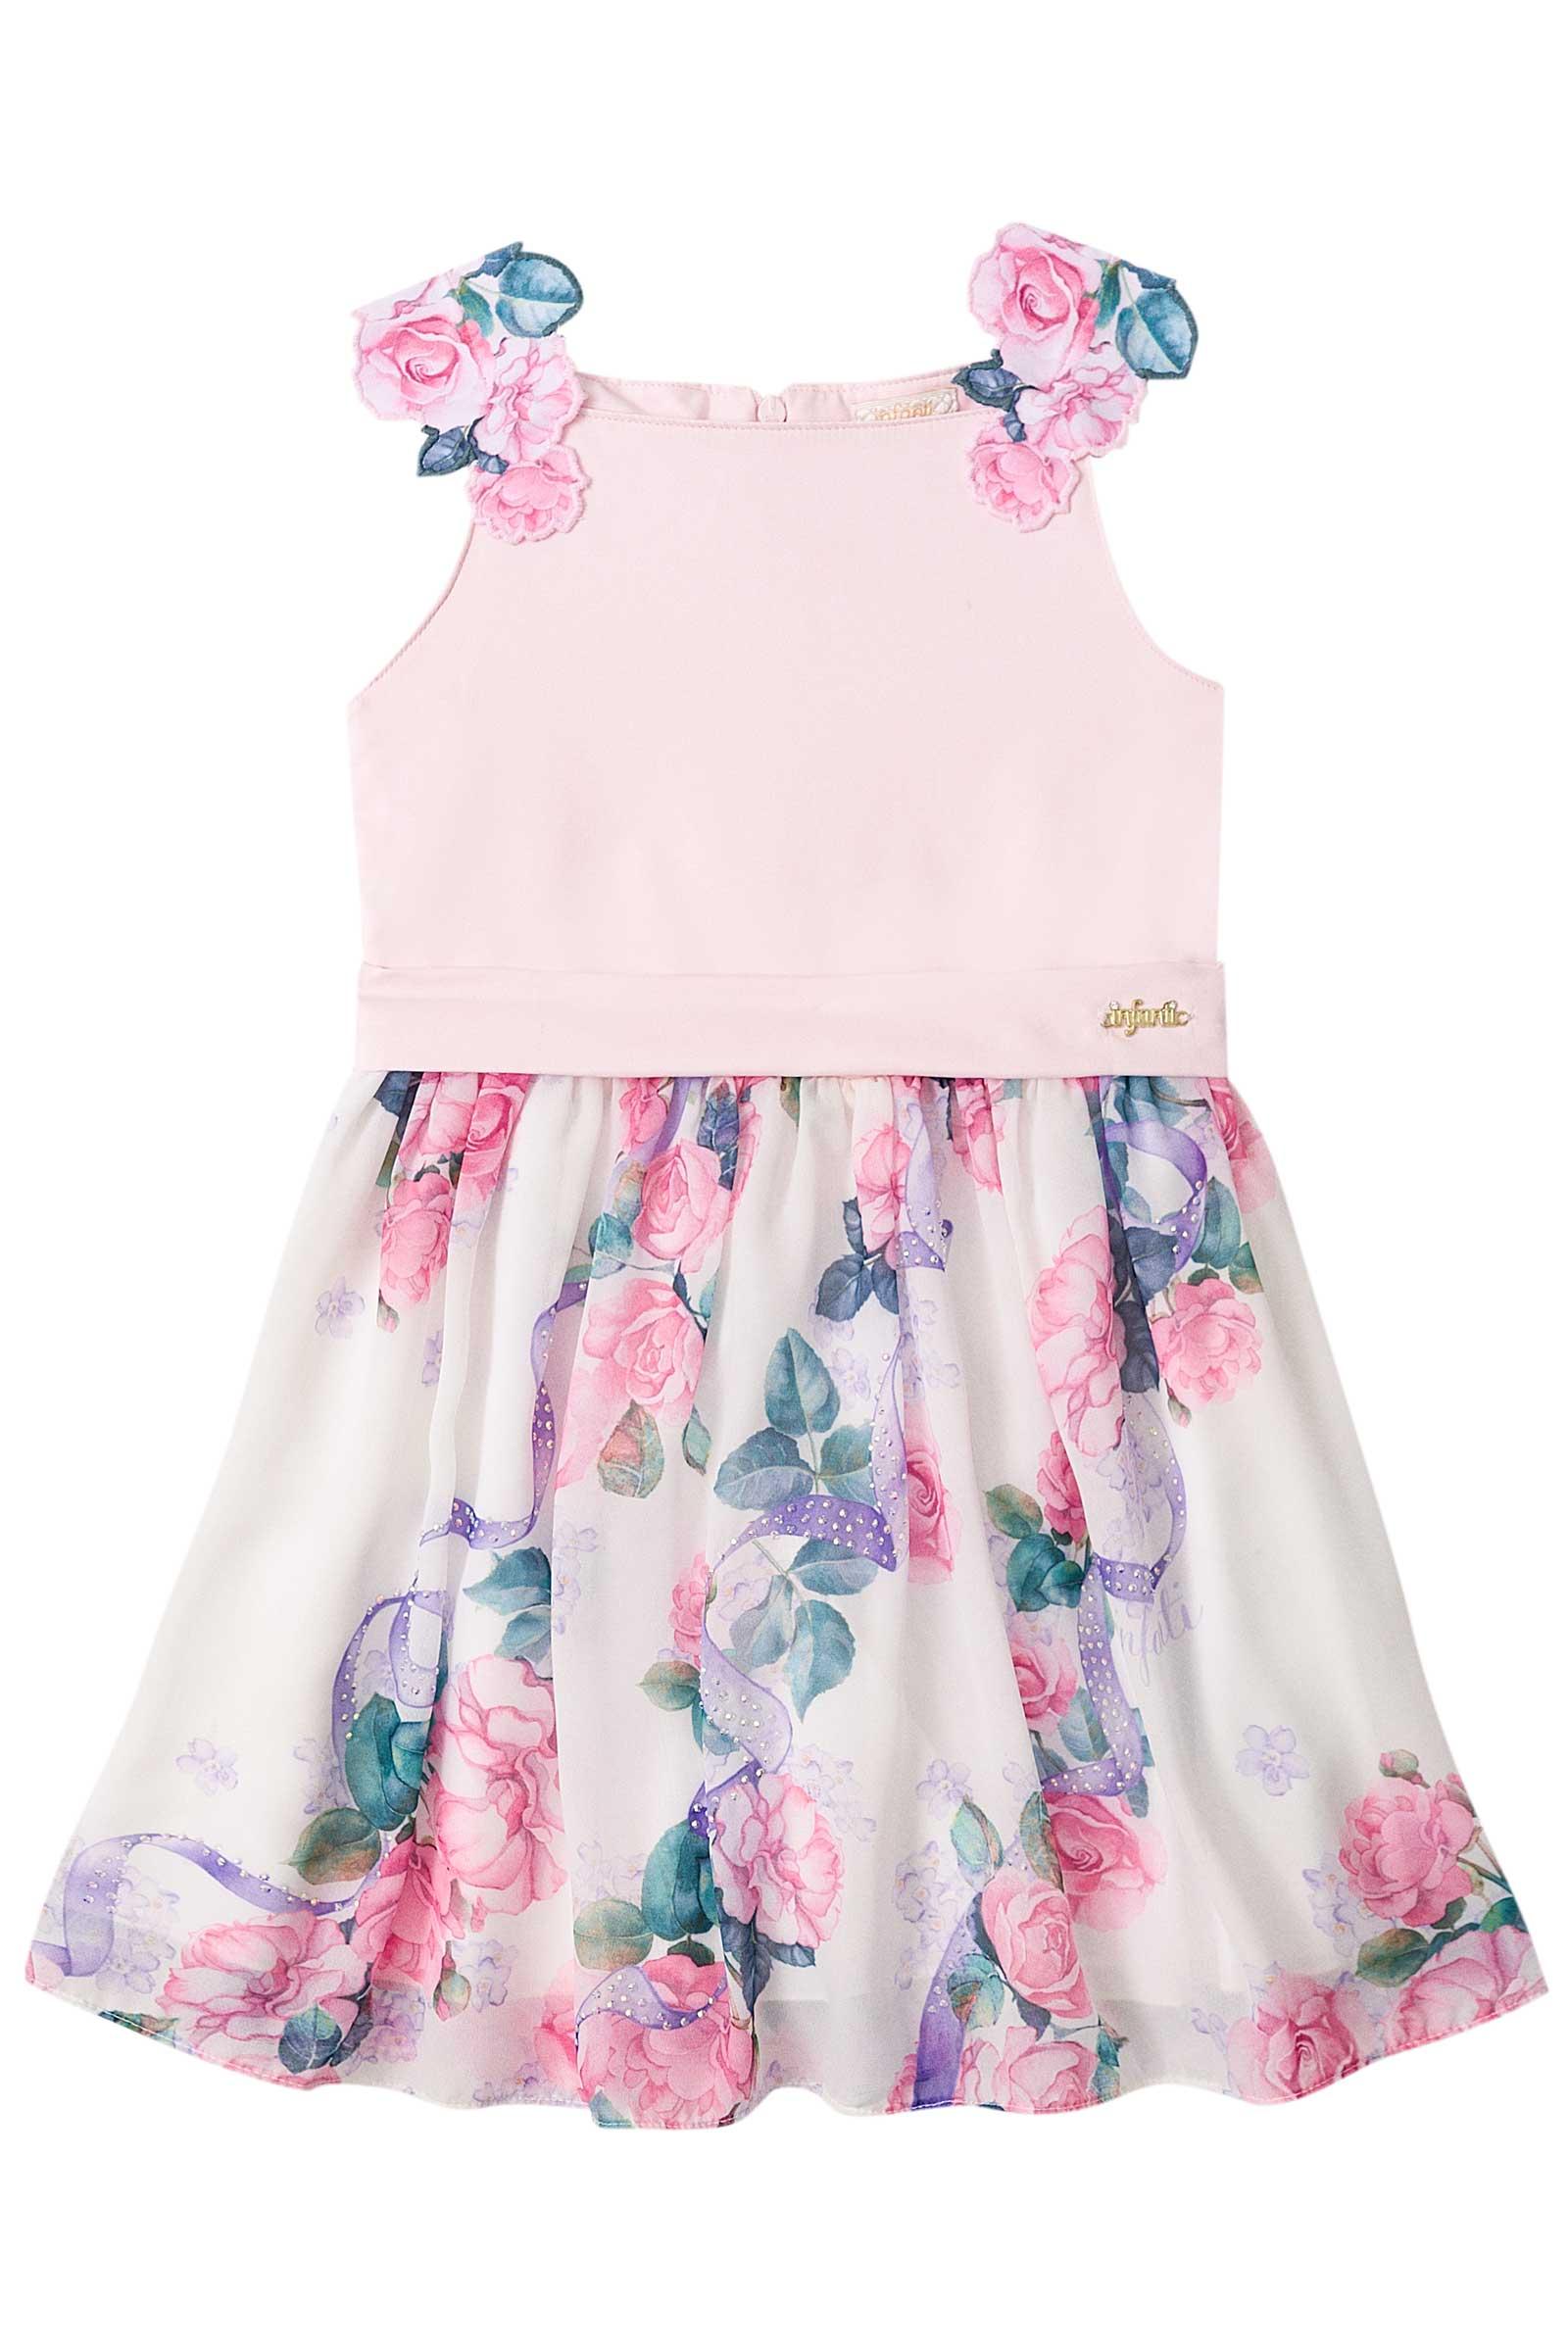 4a681f453 Vestido Infantil Infanti Floral Rosa - Pamplemousse